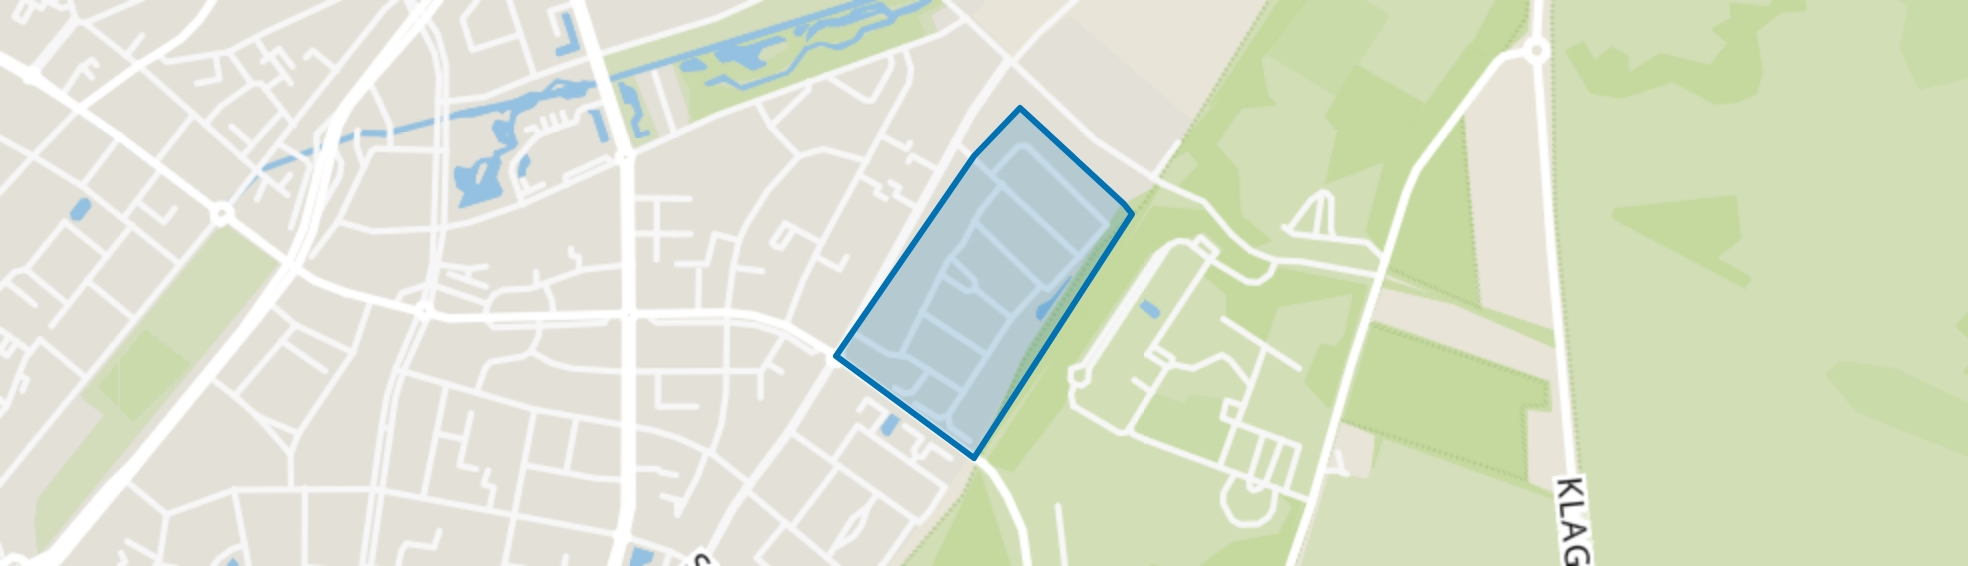 Groenstraat-Noord, Venlo map